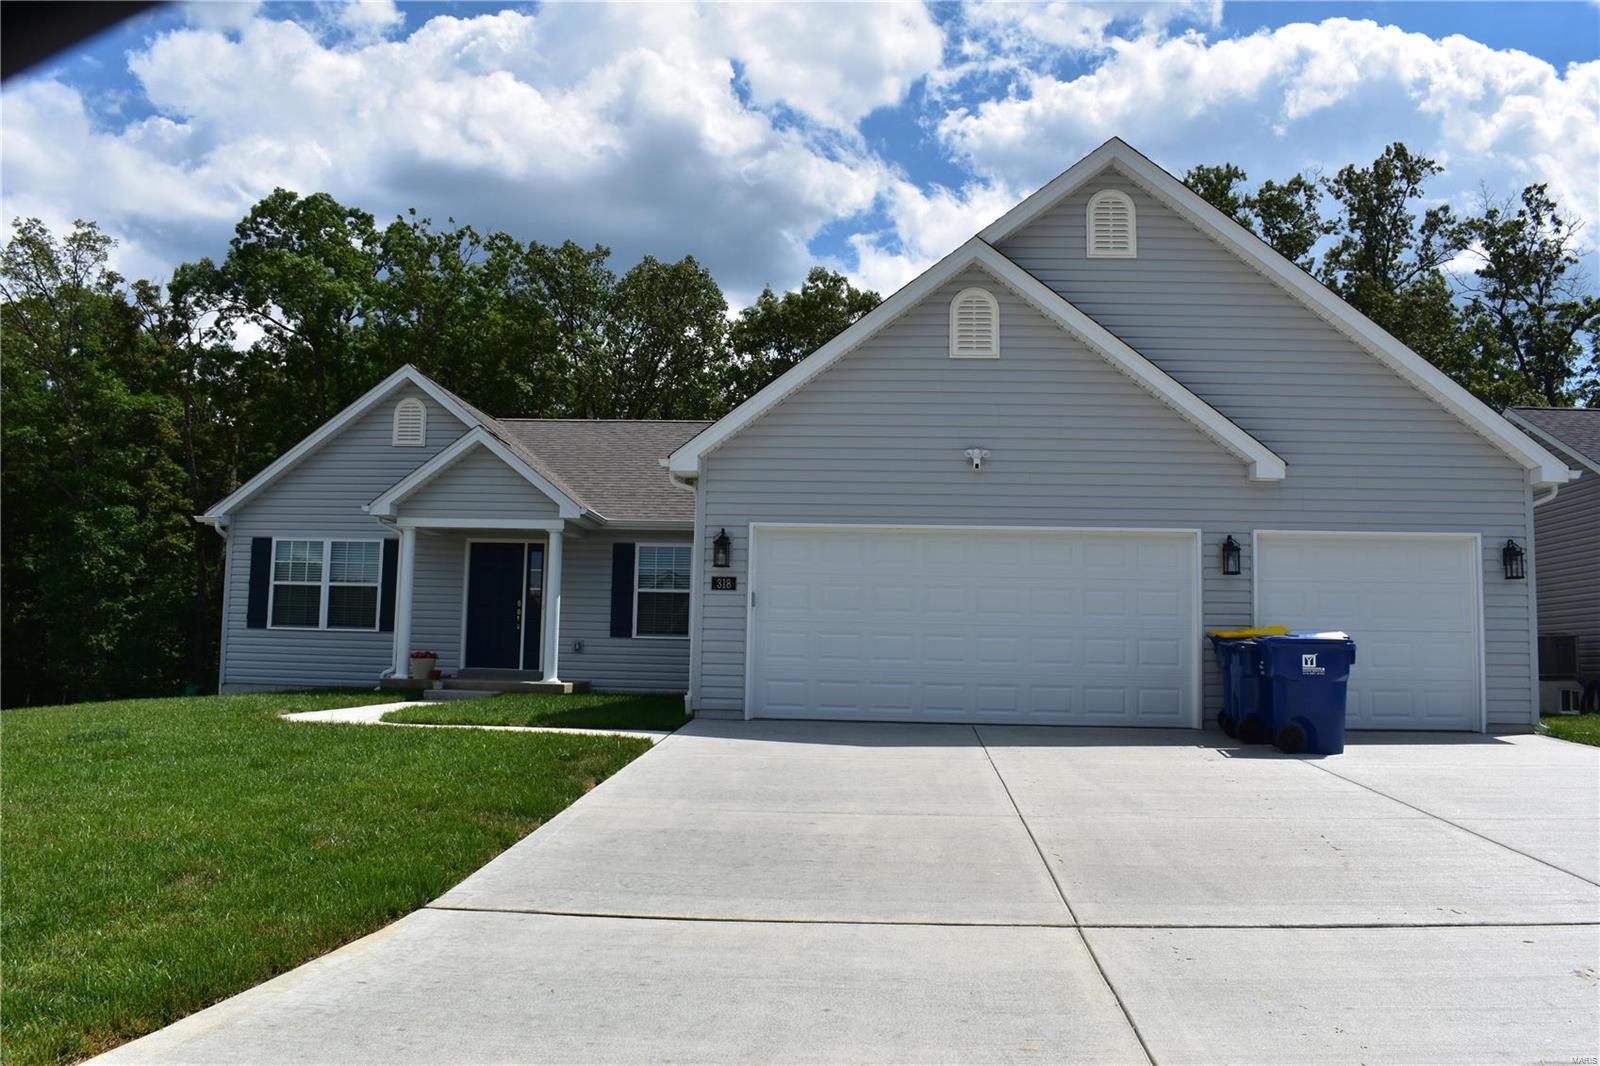 313 TBB-Lot 50 Carolyn Circle Property Photo - Wright City, MO real estate listing